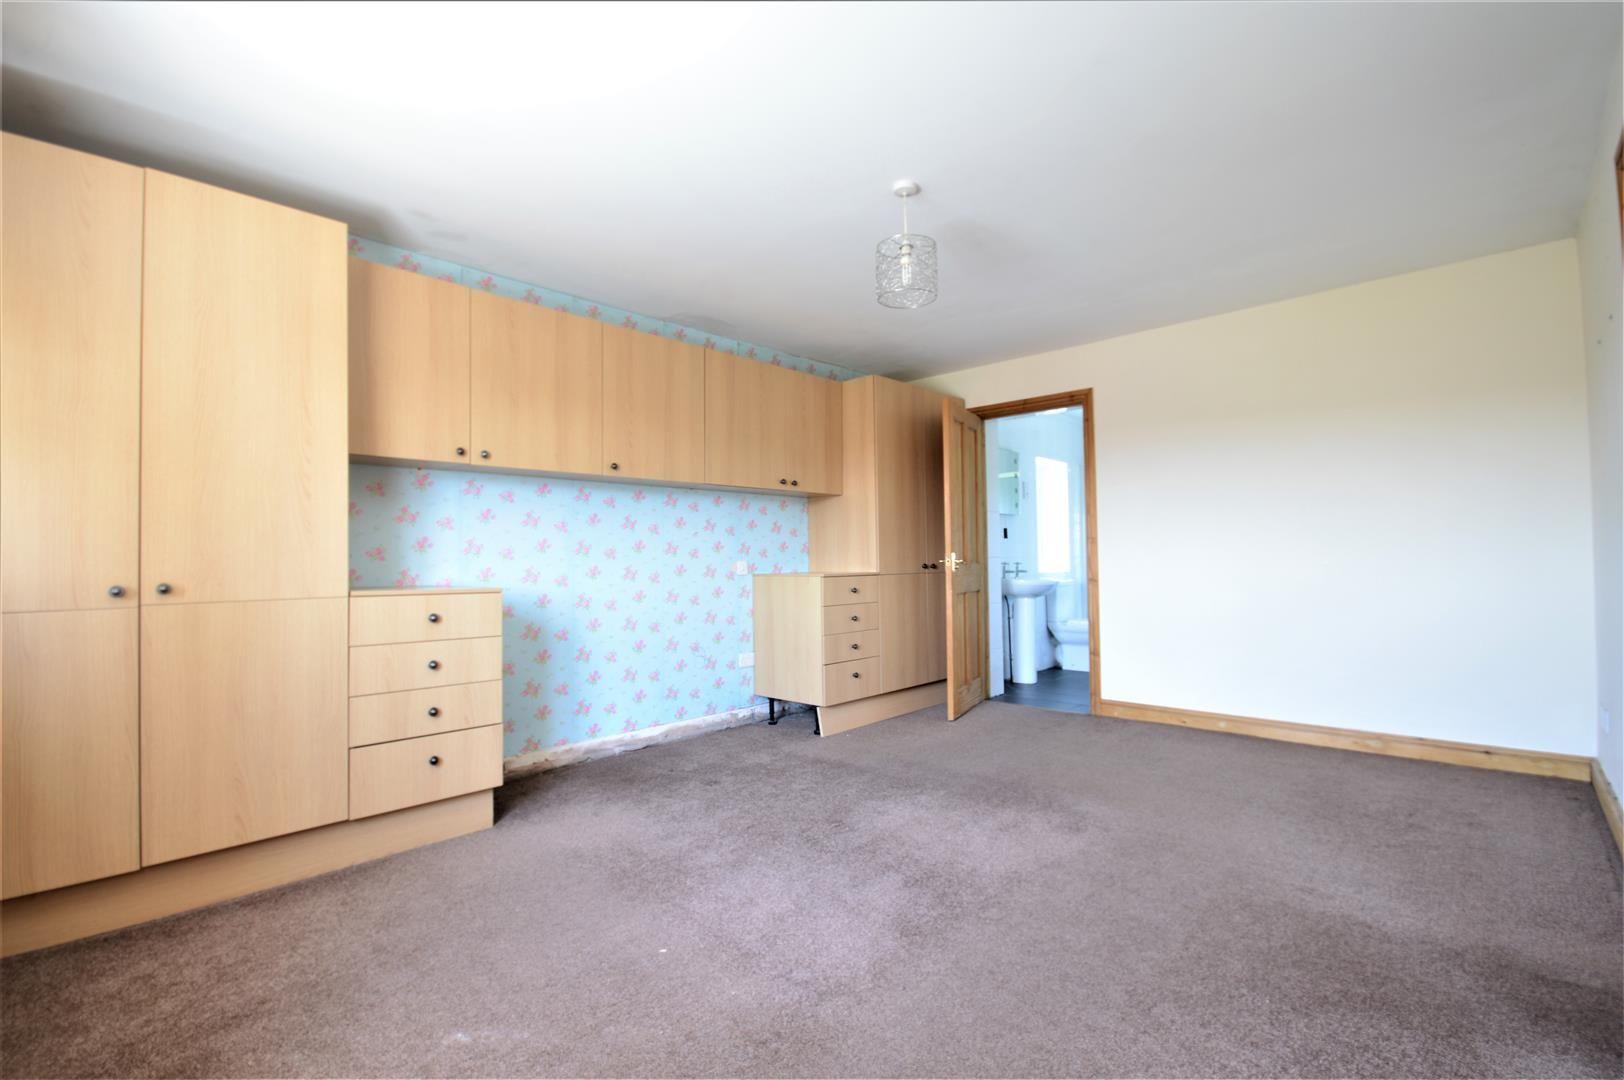 5 bed detached for sale in Sutton St. Nicholas 12